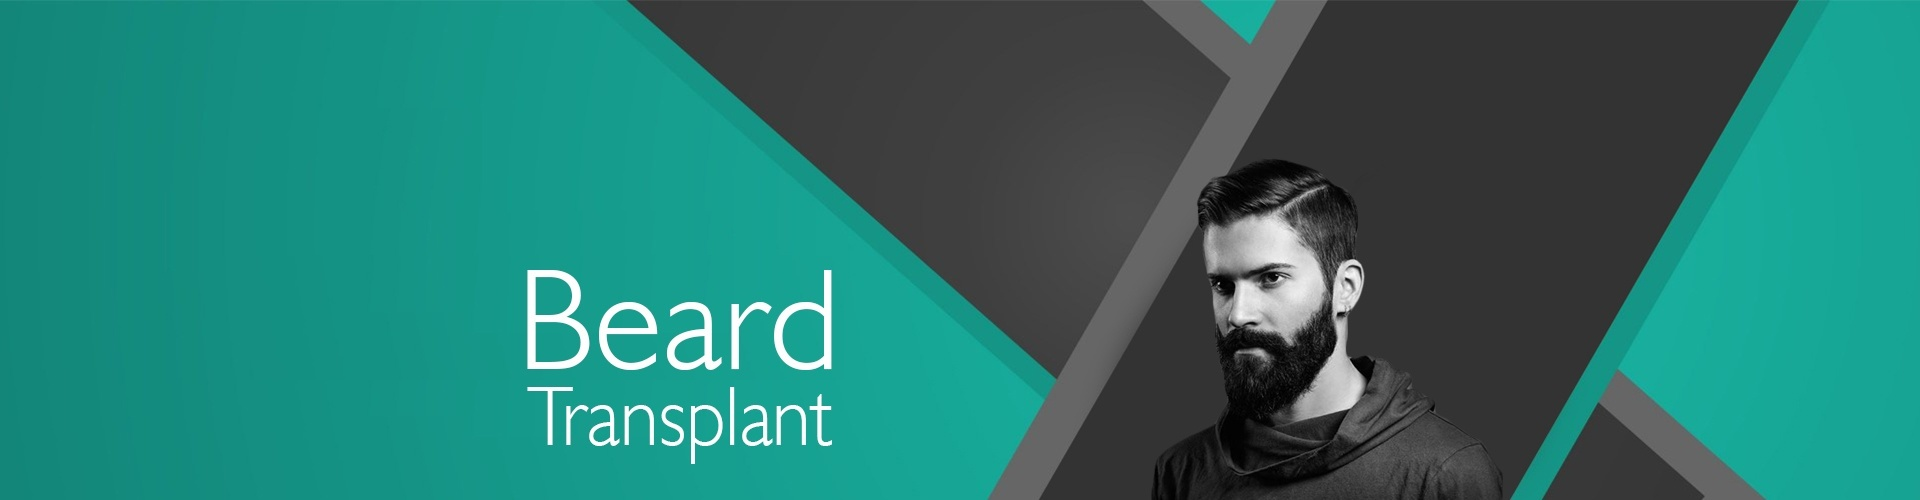 Beard Transplant Pune Beard Hair Transplant Dezire